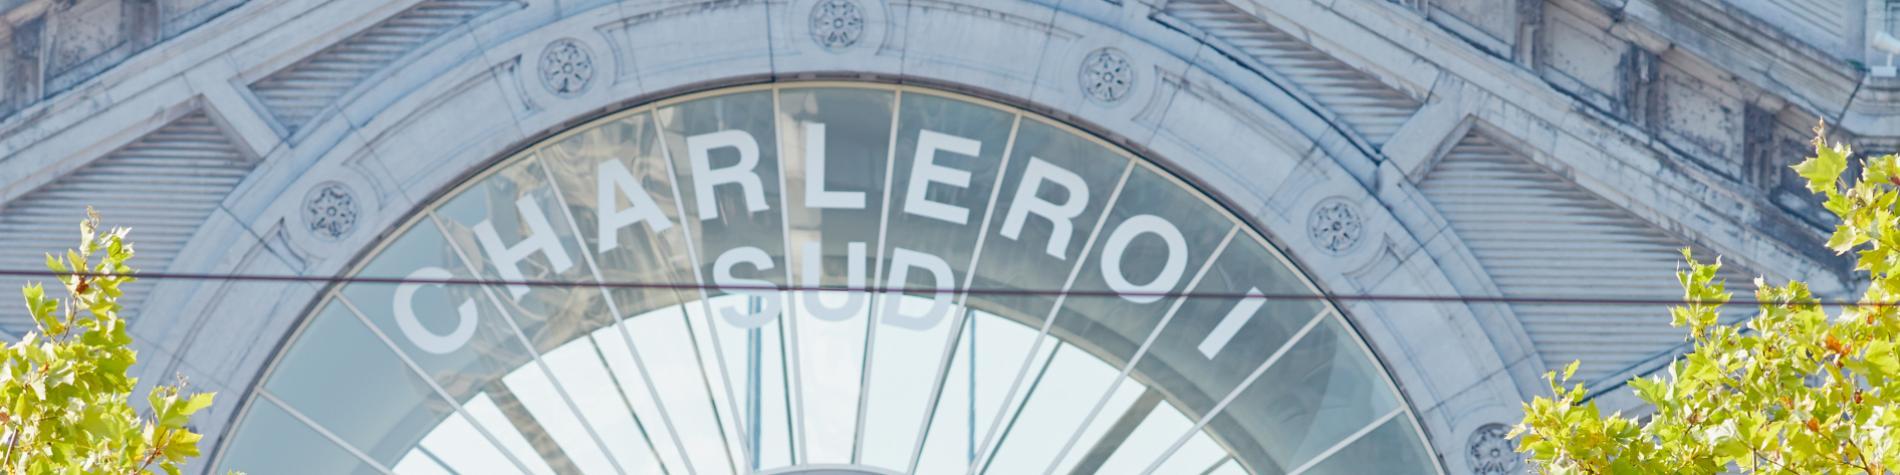 Monuments - Ville - Gare - Couple jeune - Transport ferroviaire - Charleroi